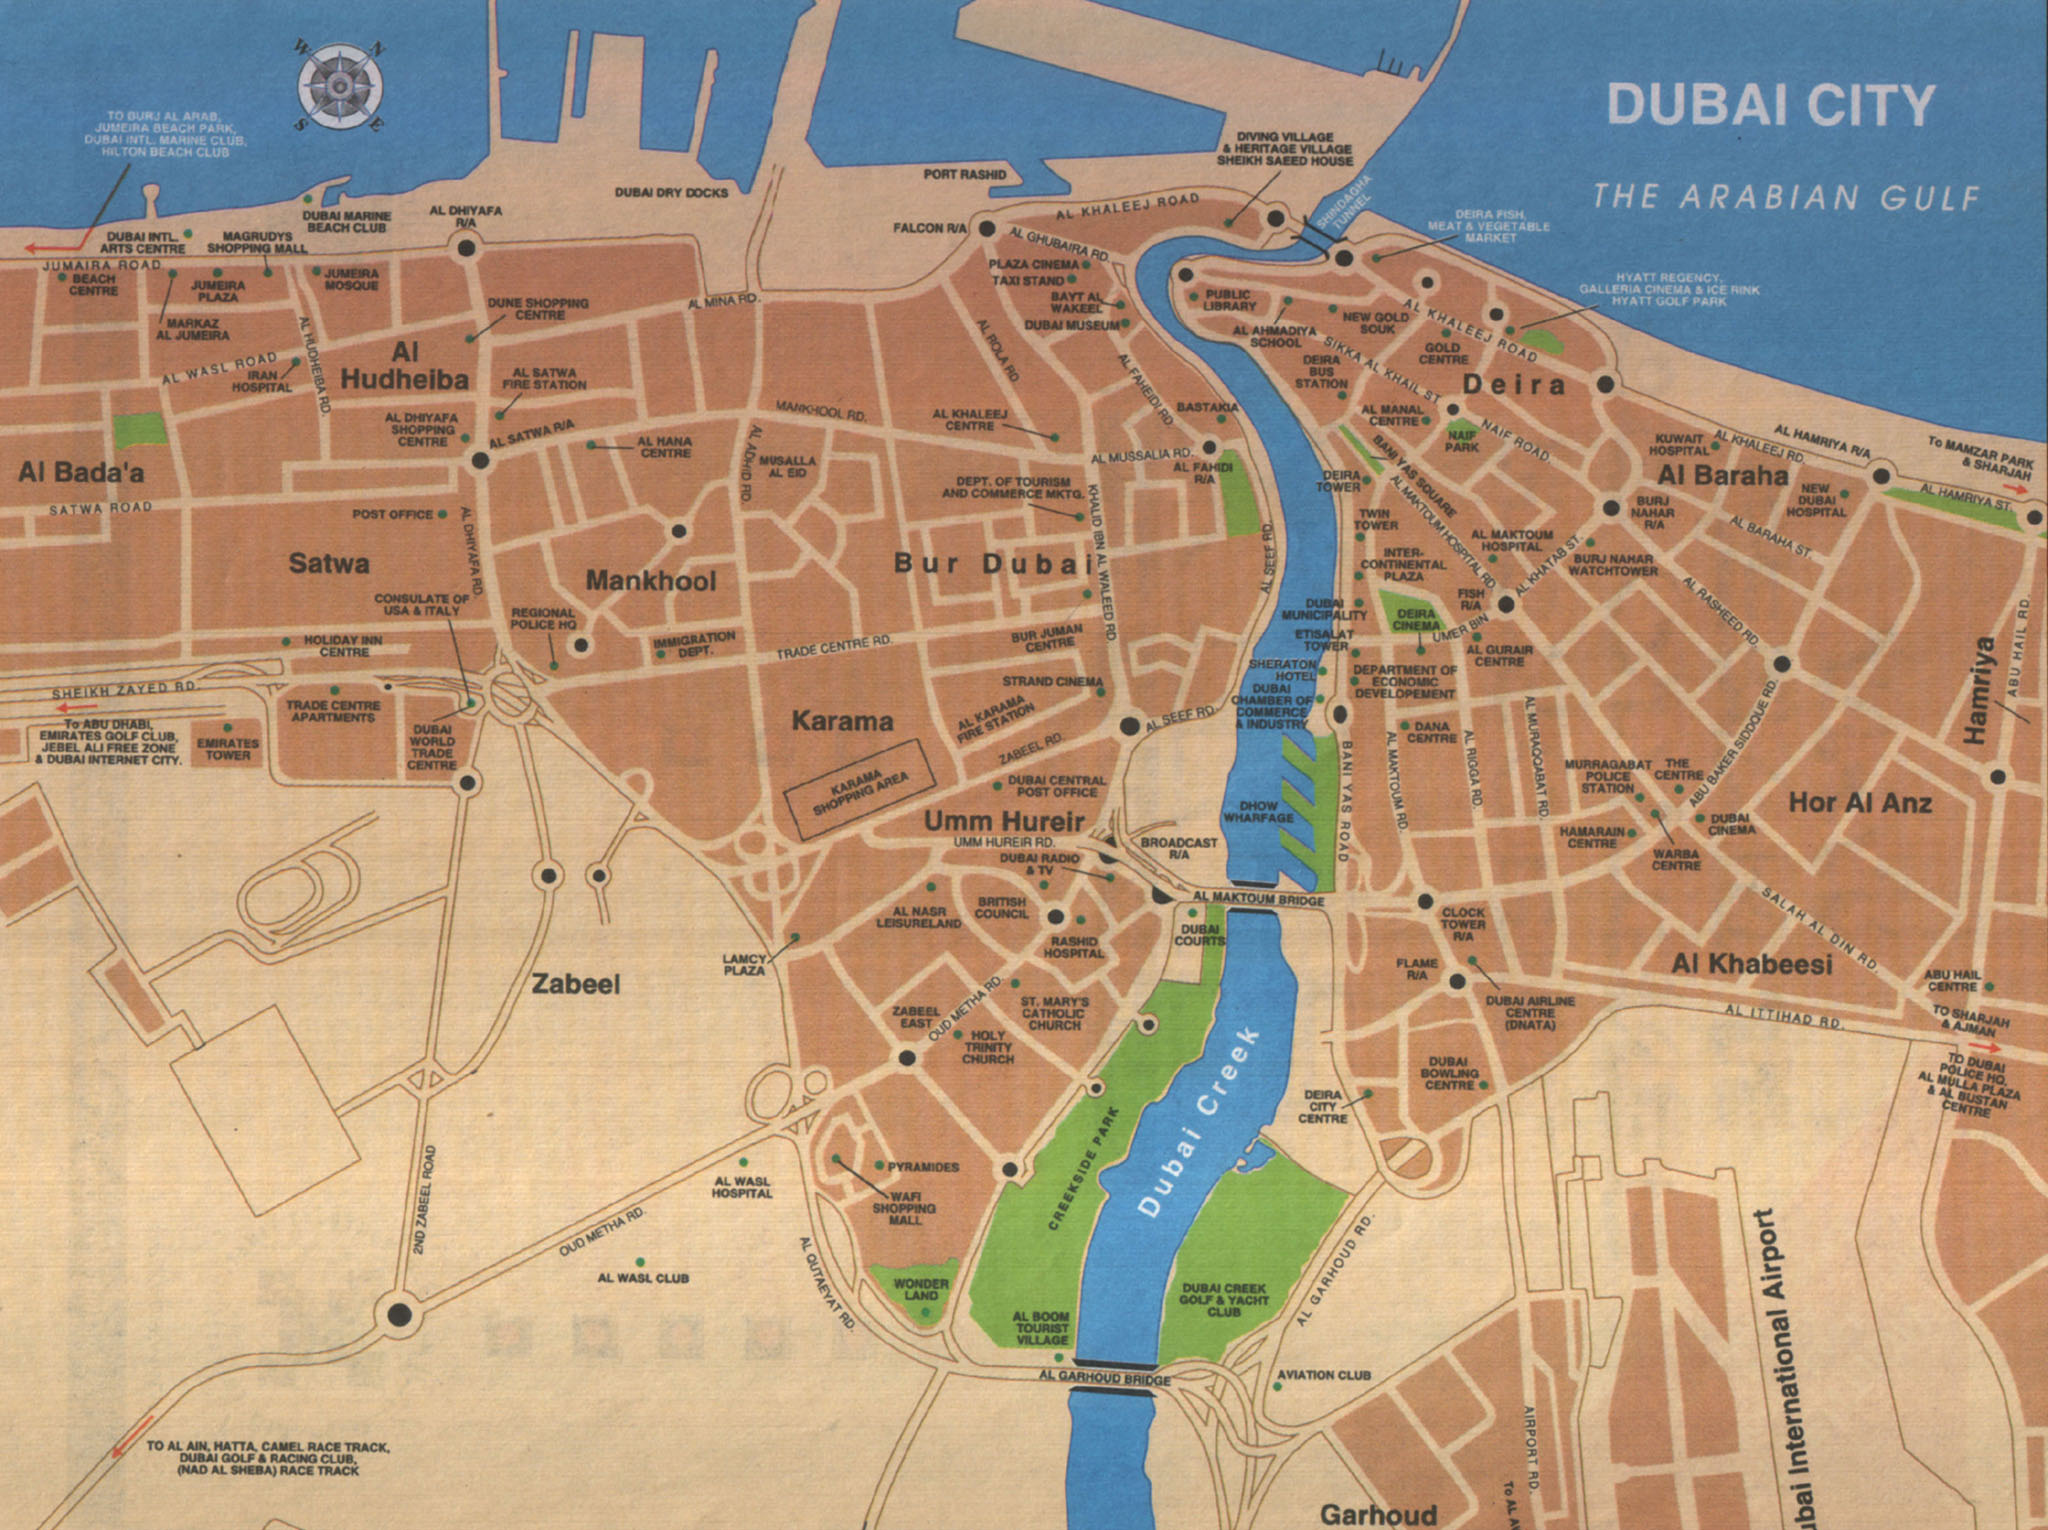 Maps of UAE (United Arab Emirates) | Map Library | Maps of the World